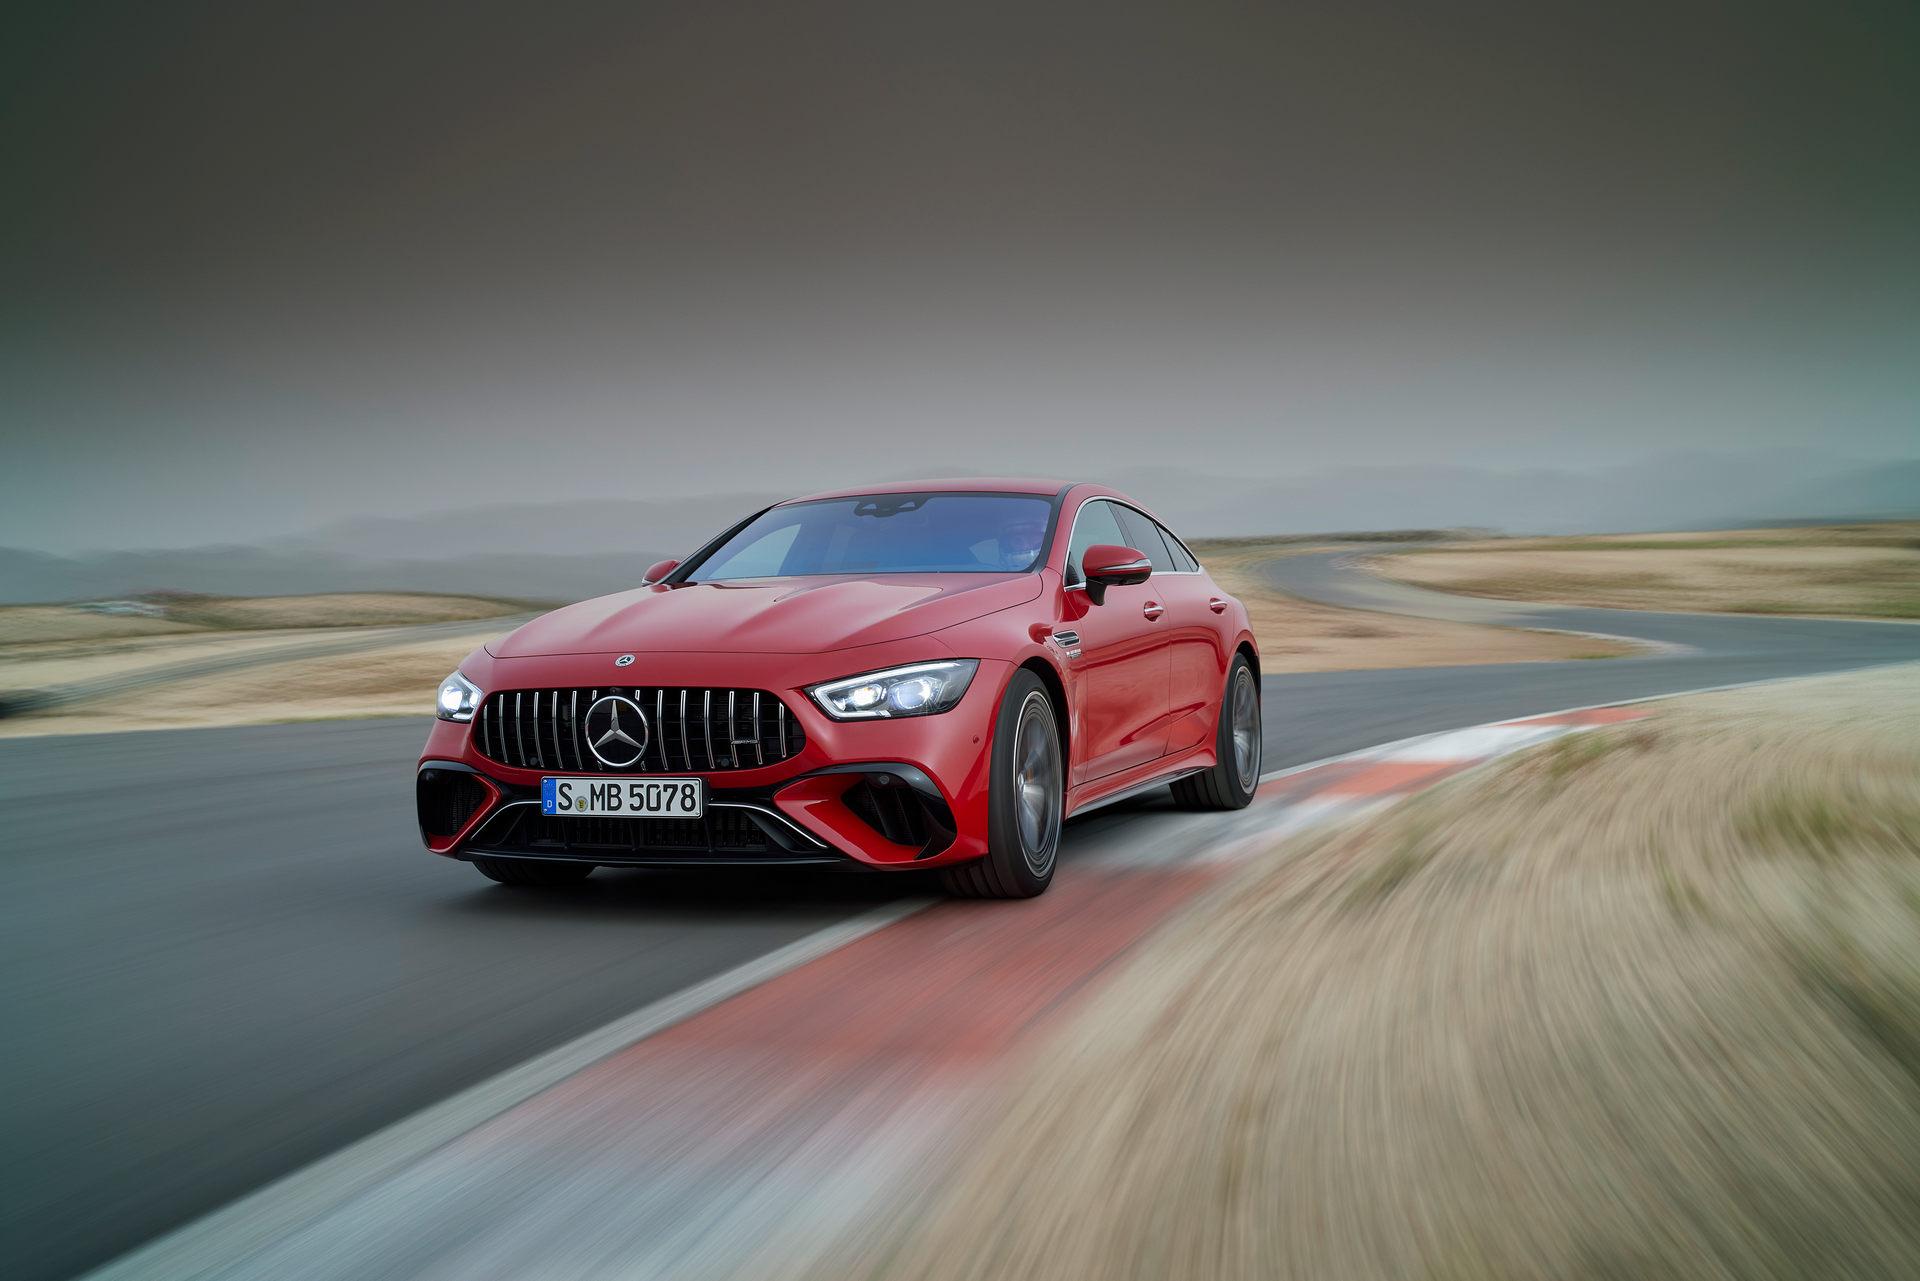 2023 Mercedes-AMG GT 63 S E Performance 4-door Front Three-Quarter Wallpapers (7)